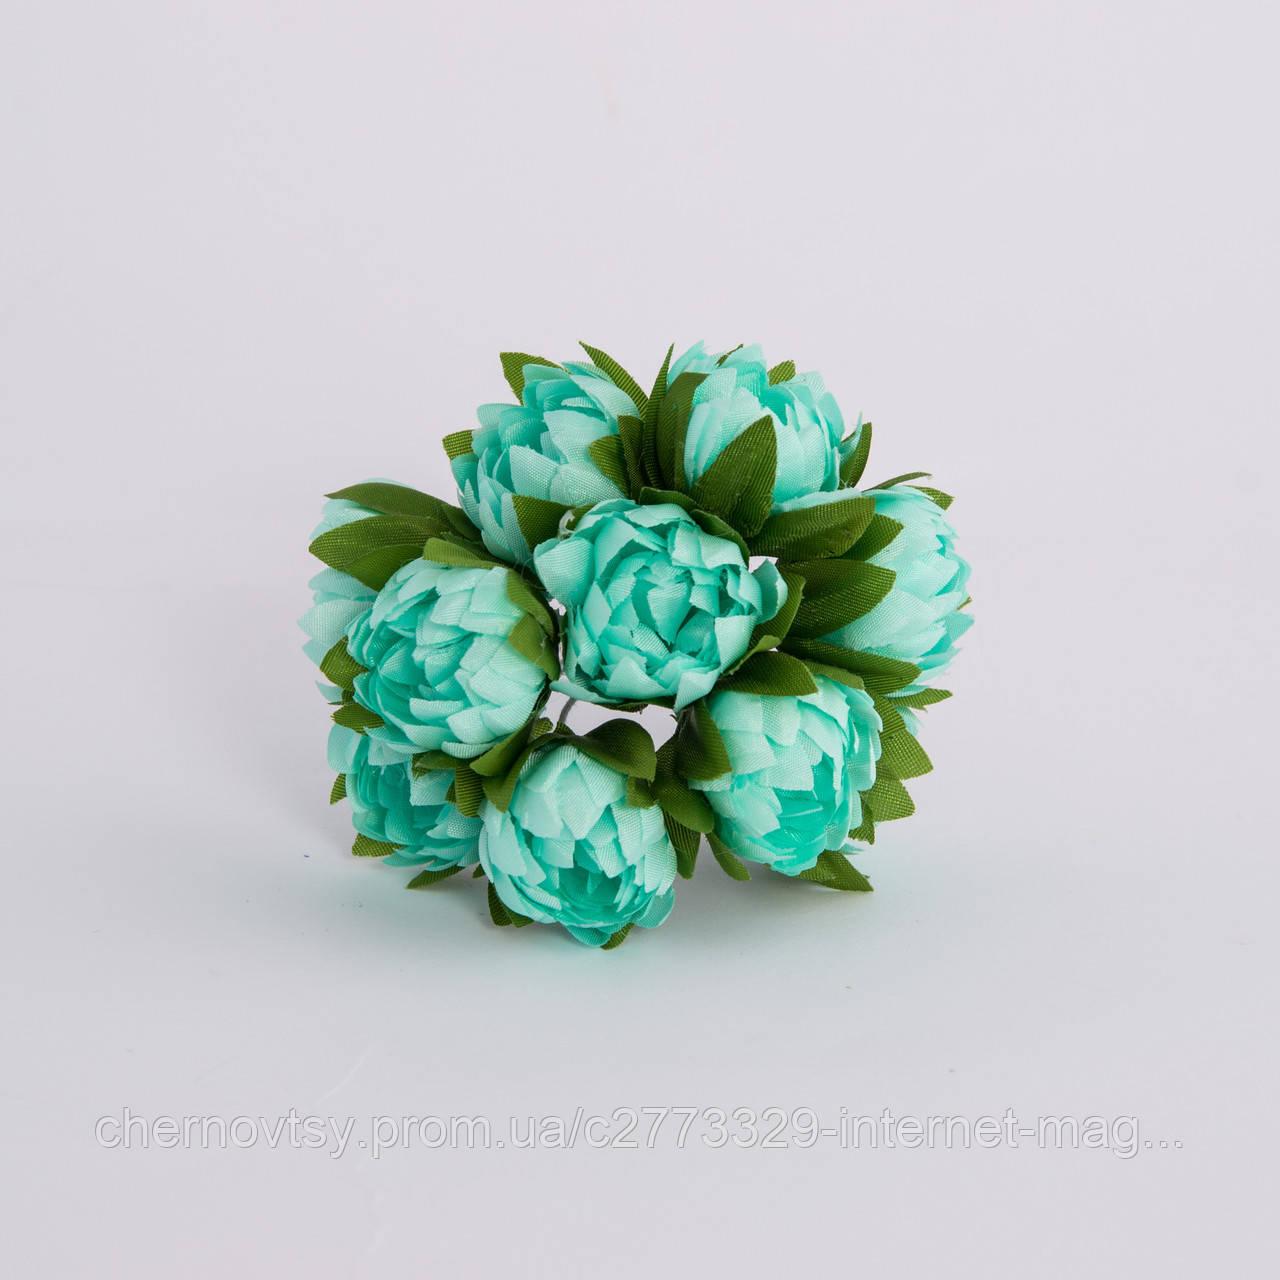 Хризантемы на стебле 10 шт.